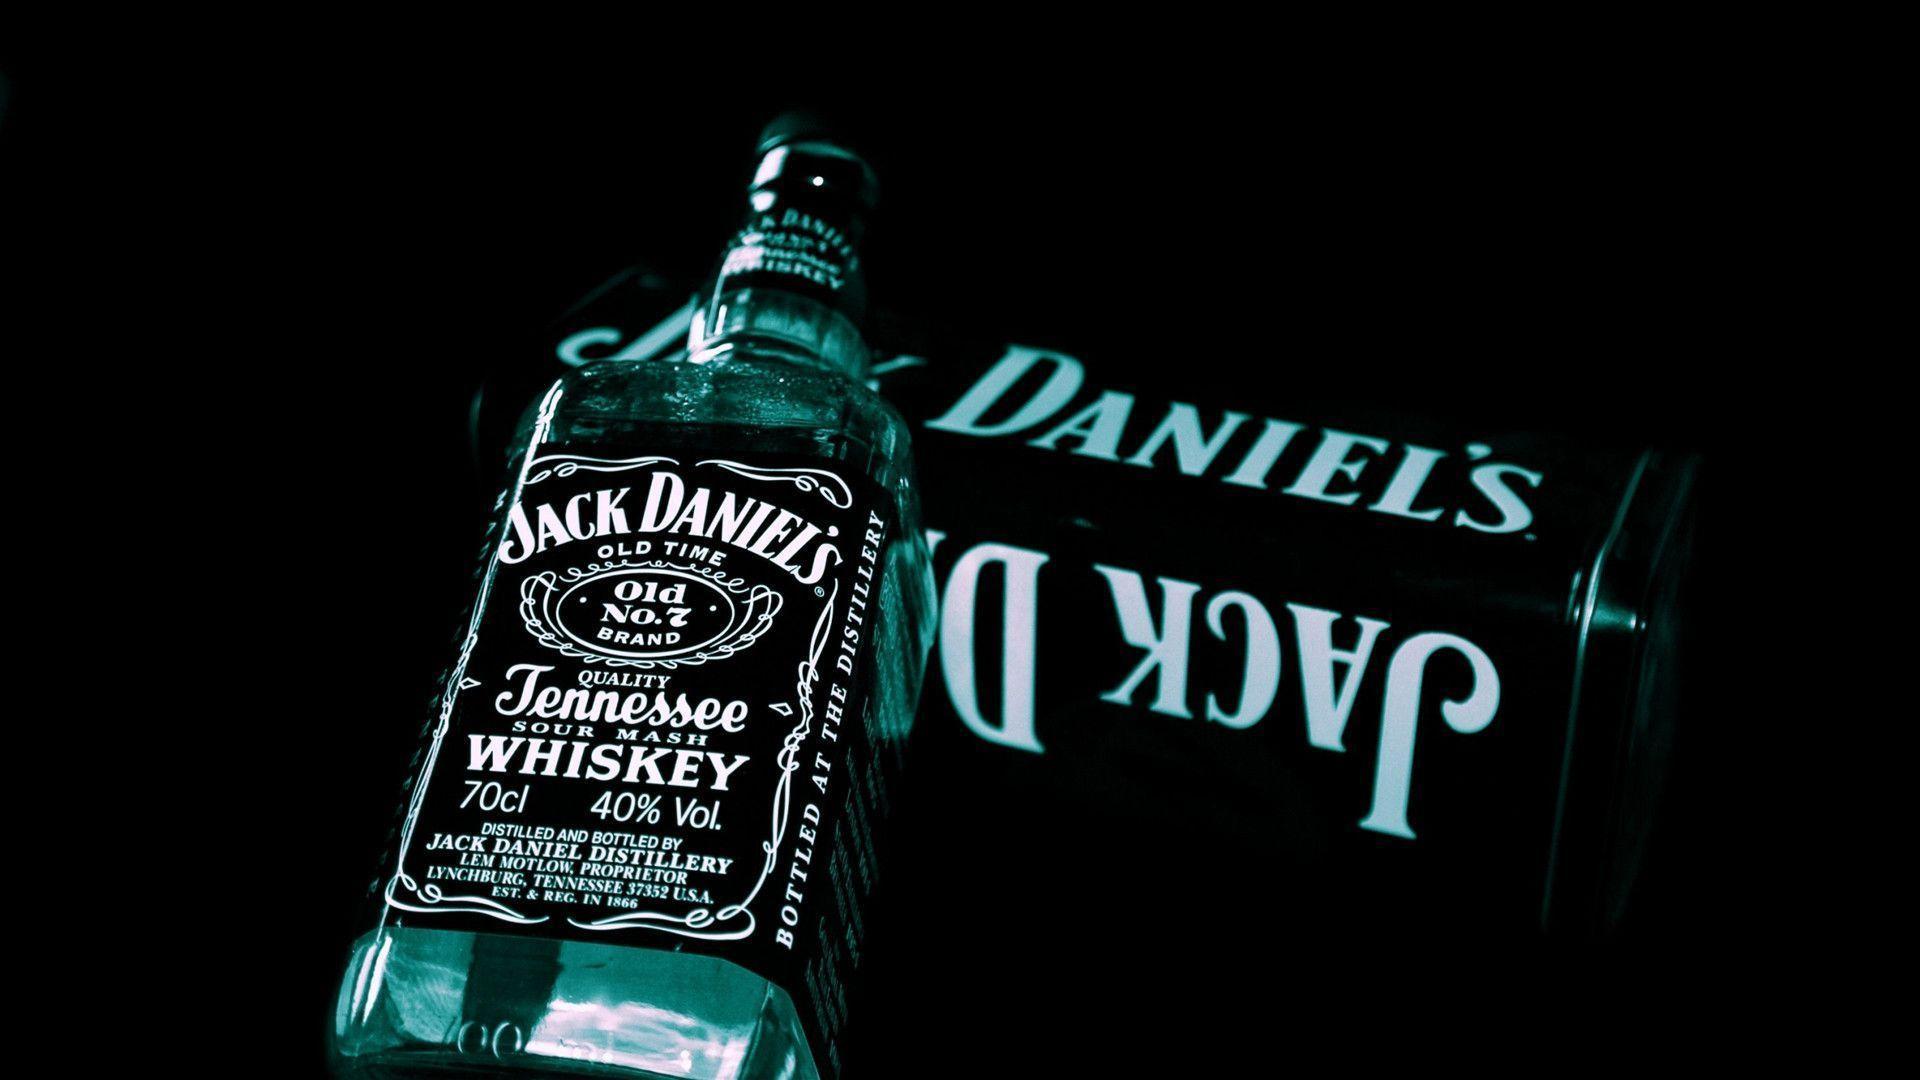 Jack Daniels Wallpapers 1920x1080